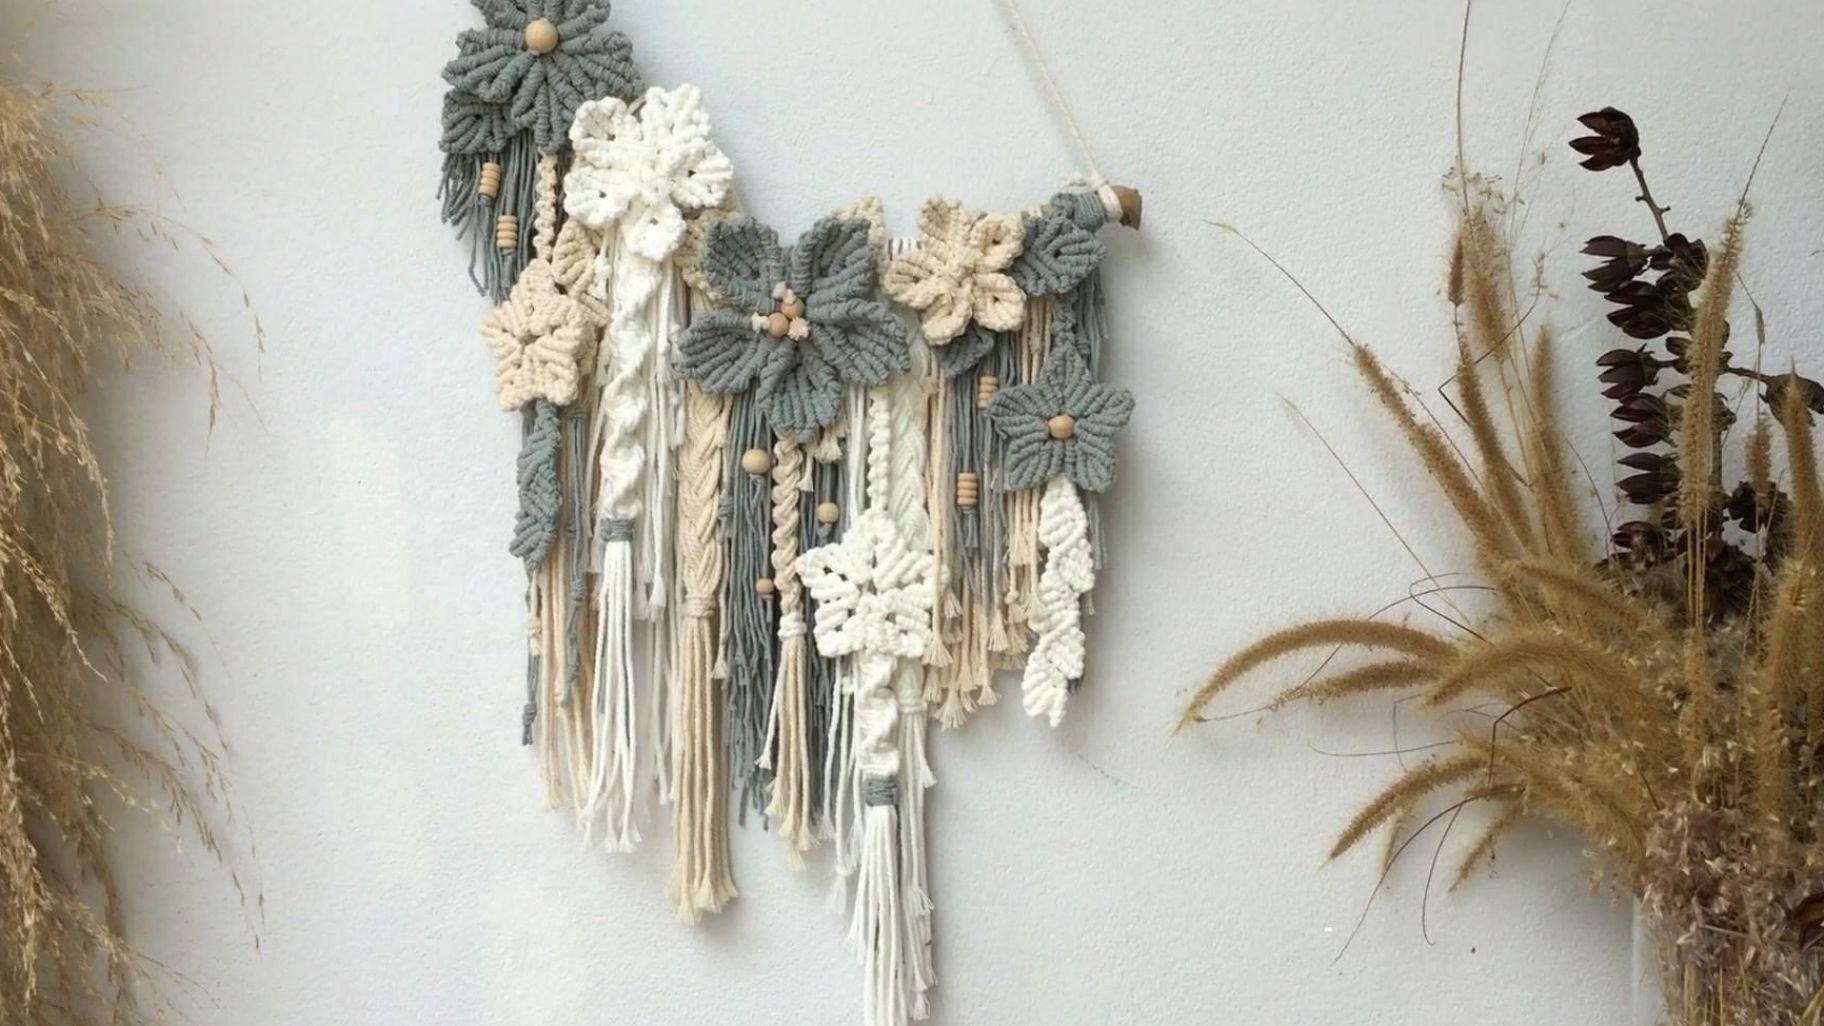 Flower Macrame Wall Hanging